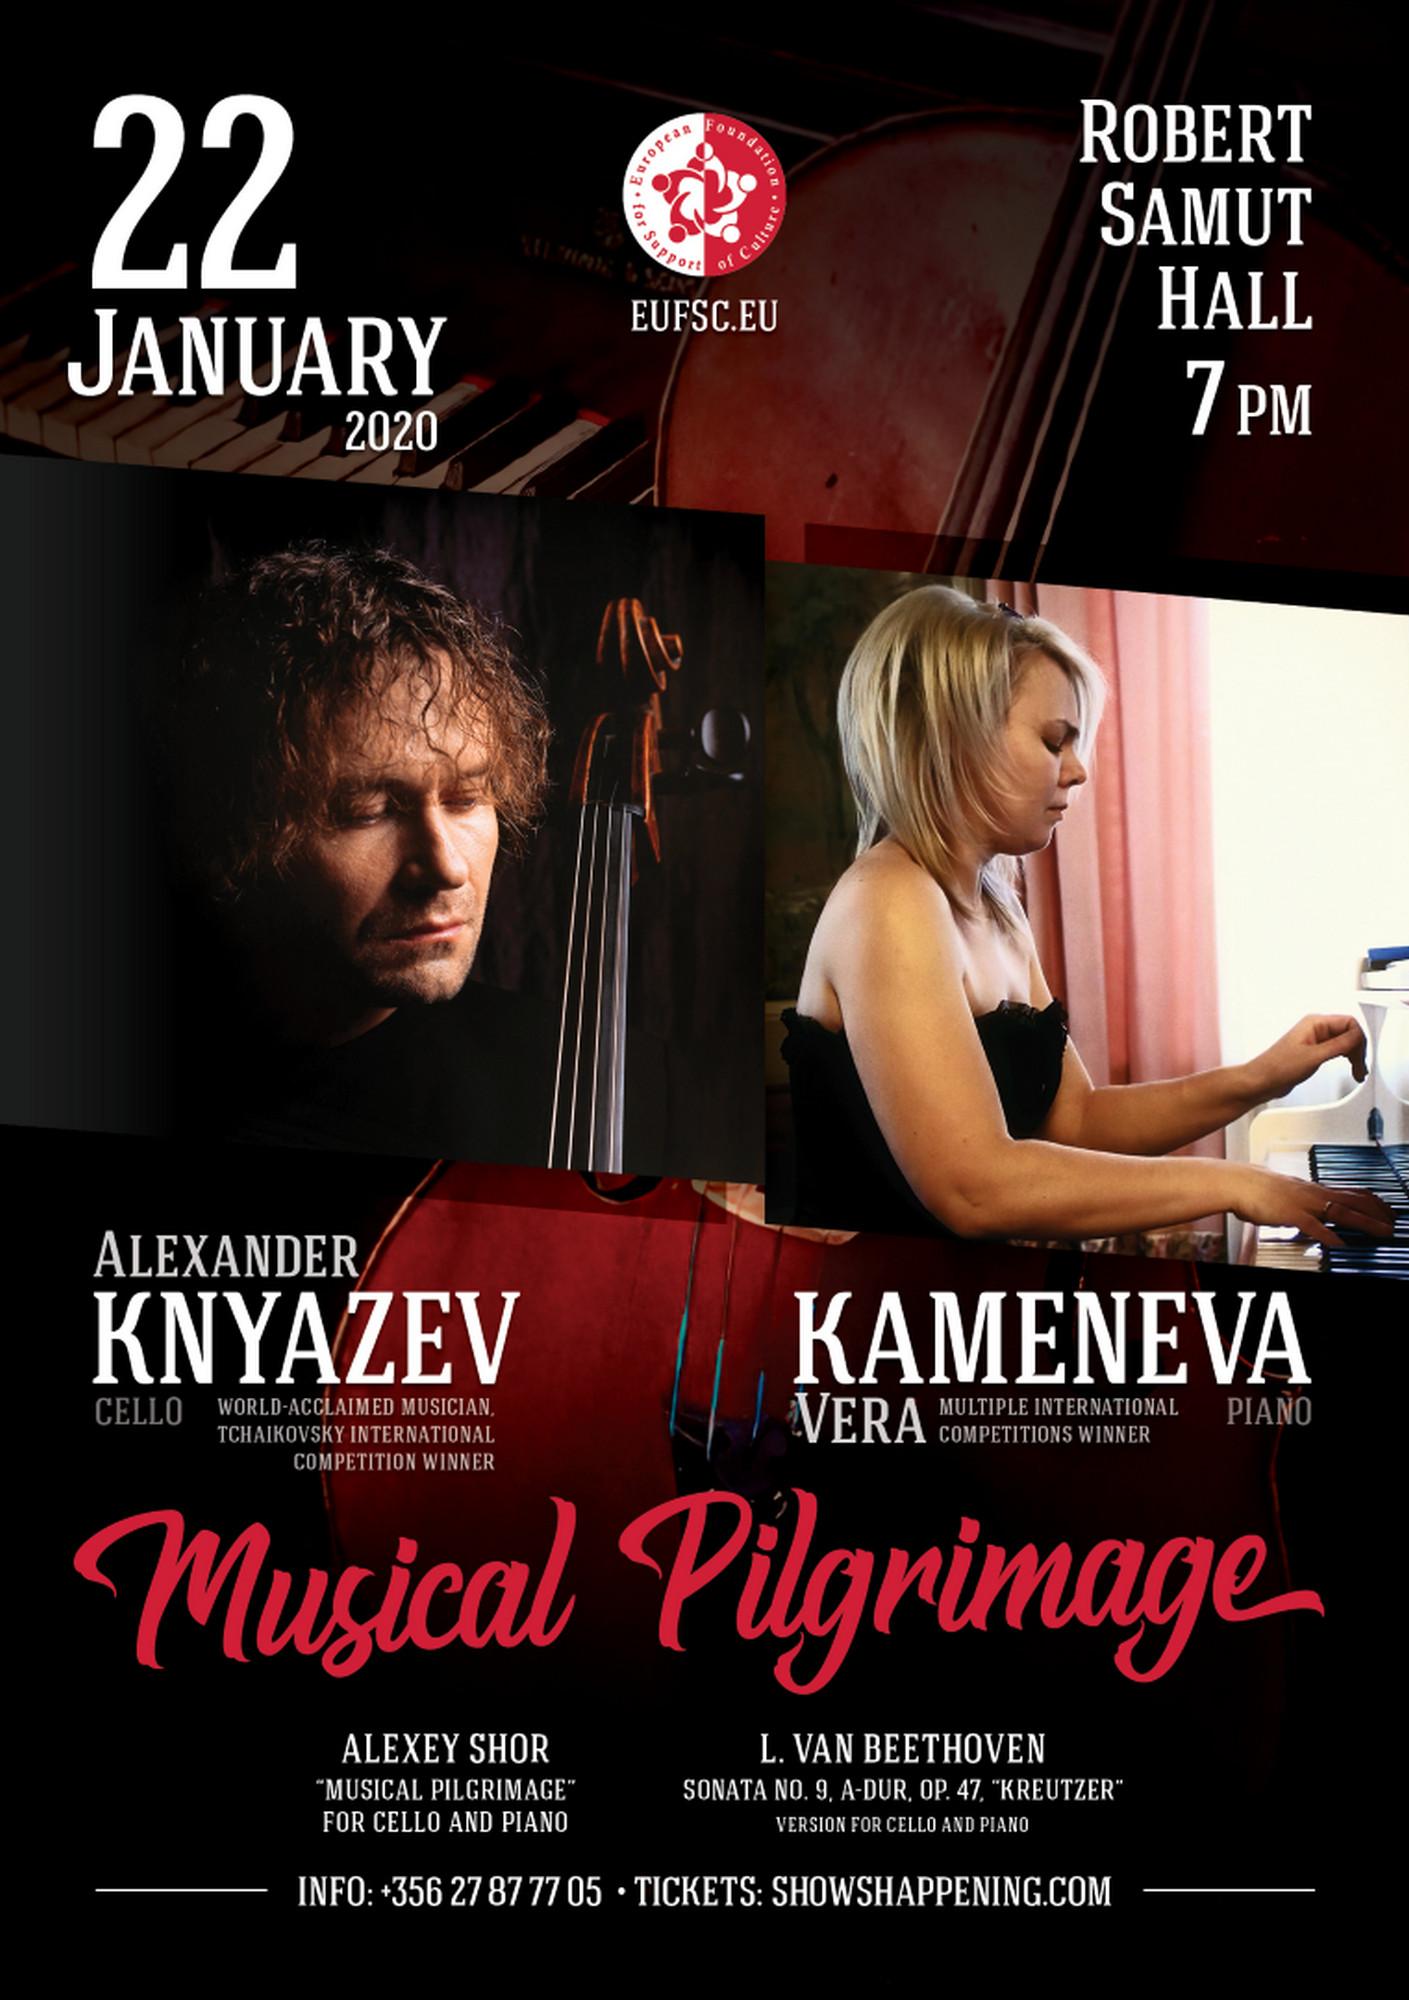 Musical Pilgrimage flyer